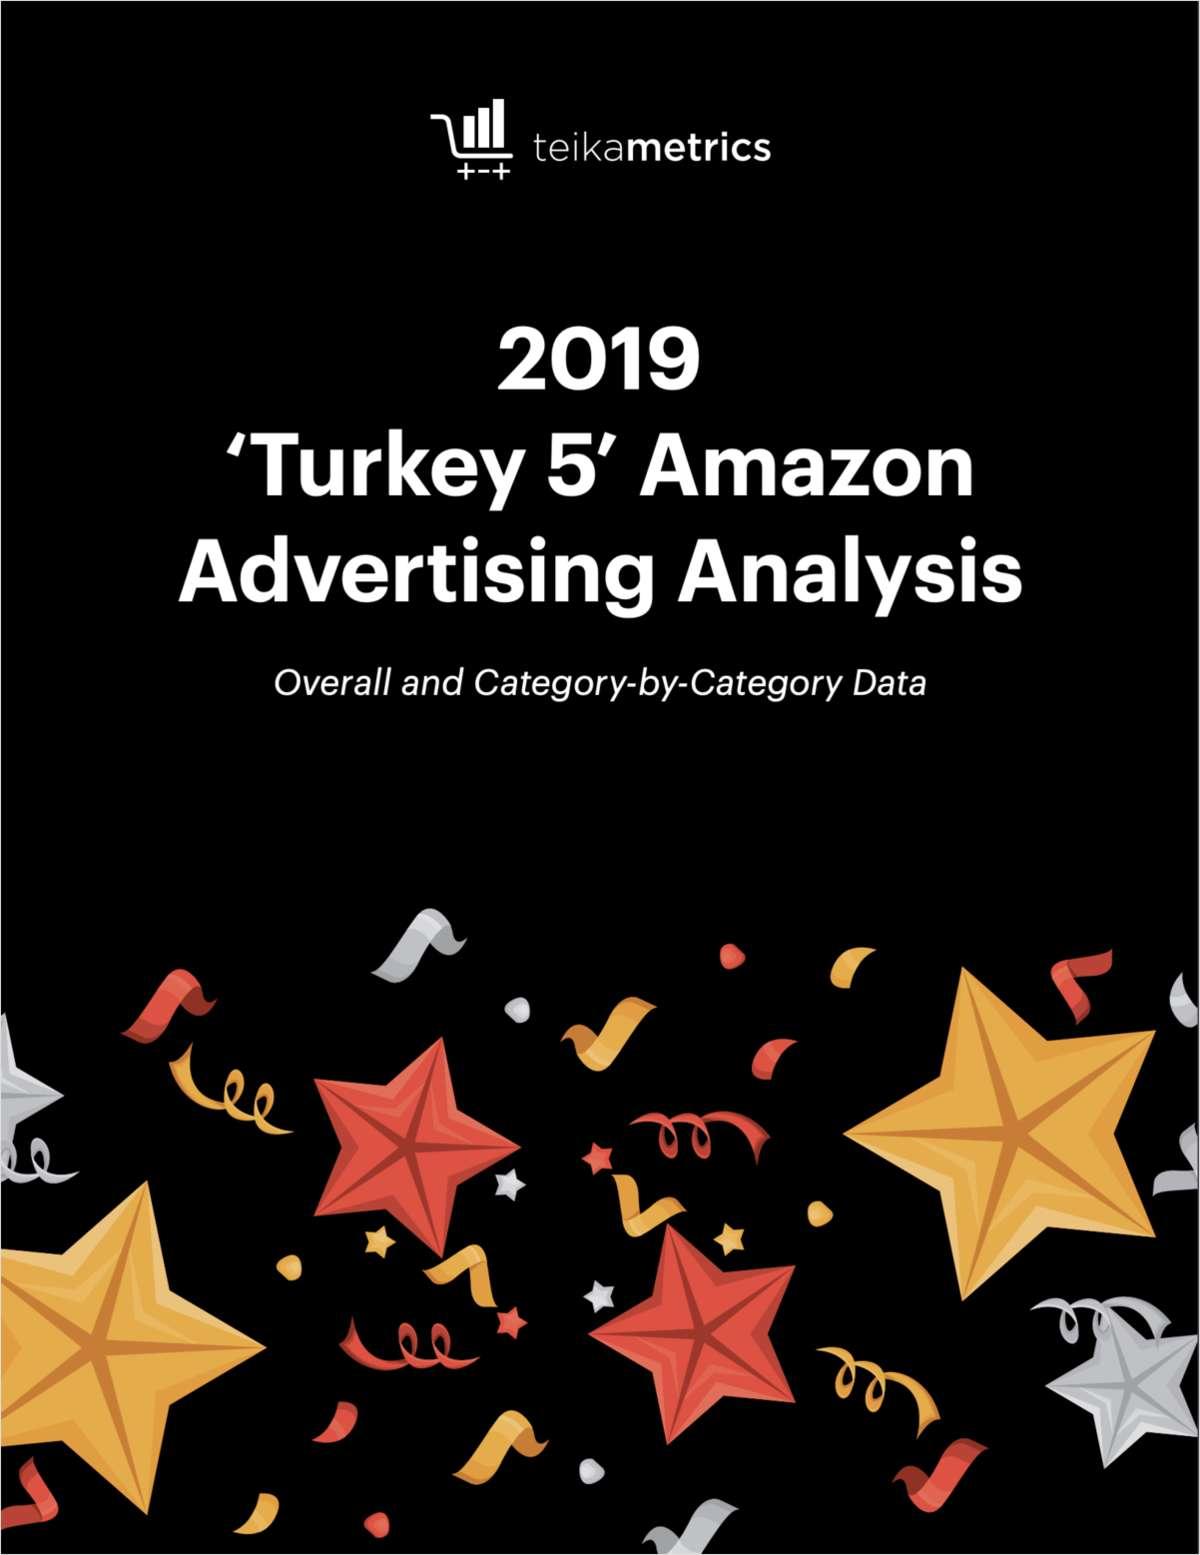 2019 Turkey 5 Amazon Advertising Analysis